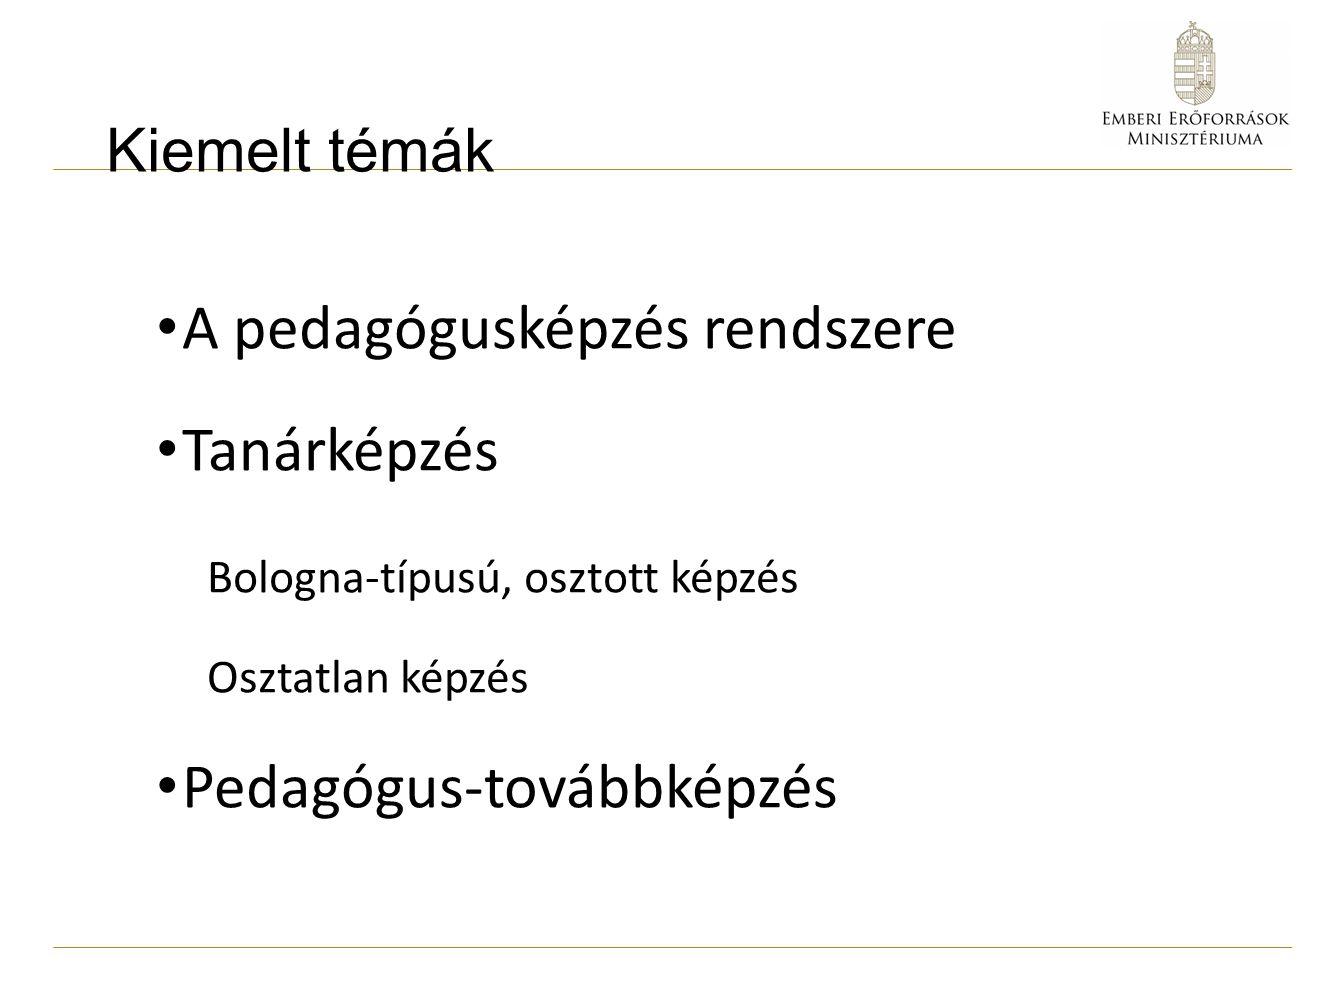 Köszönöm a figyelmet! dr. Liptai Kálmán liptaik@ektf.hu liptaik@ektf.hu 23